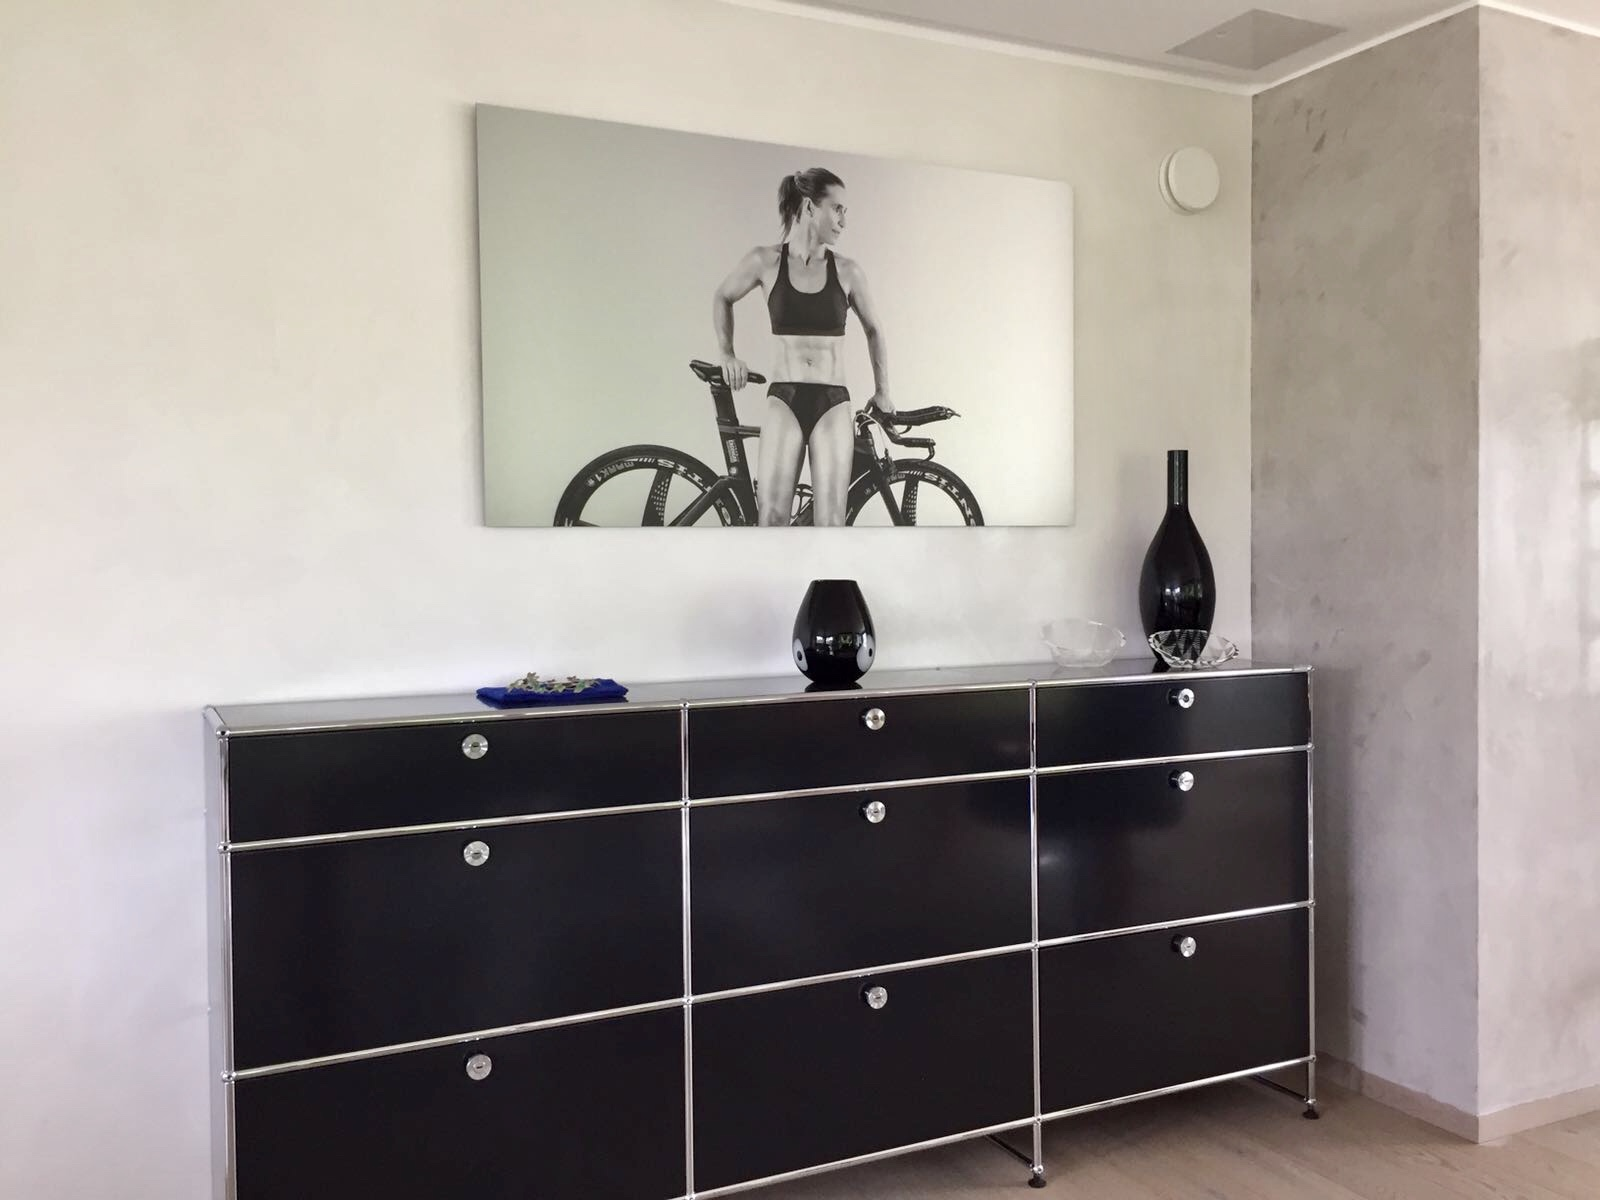 Wandgestaltung Marmorino / Silber in Wohnraum